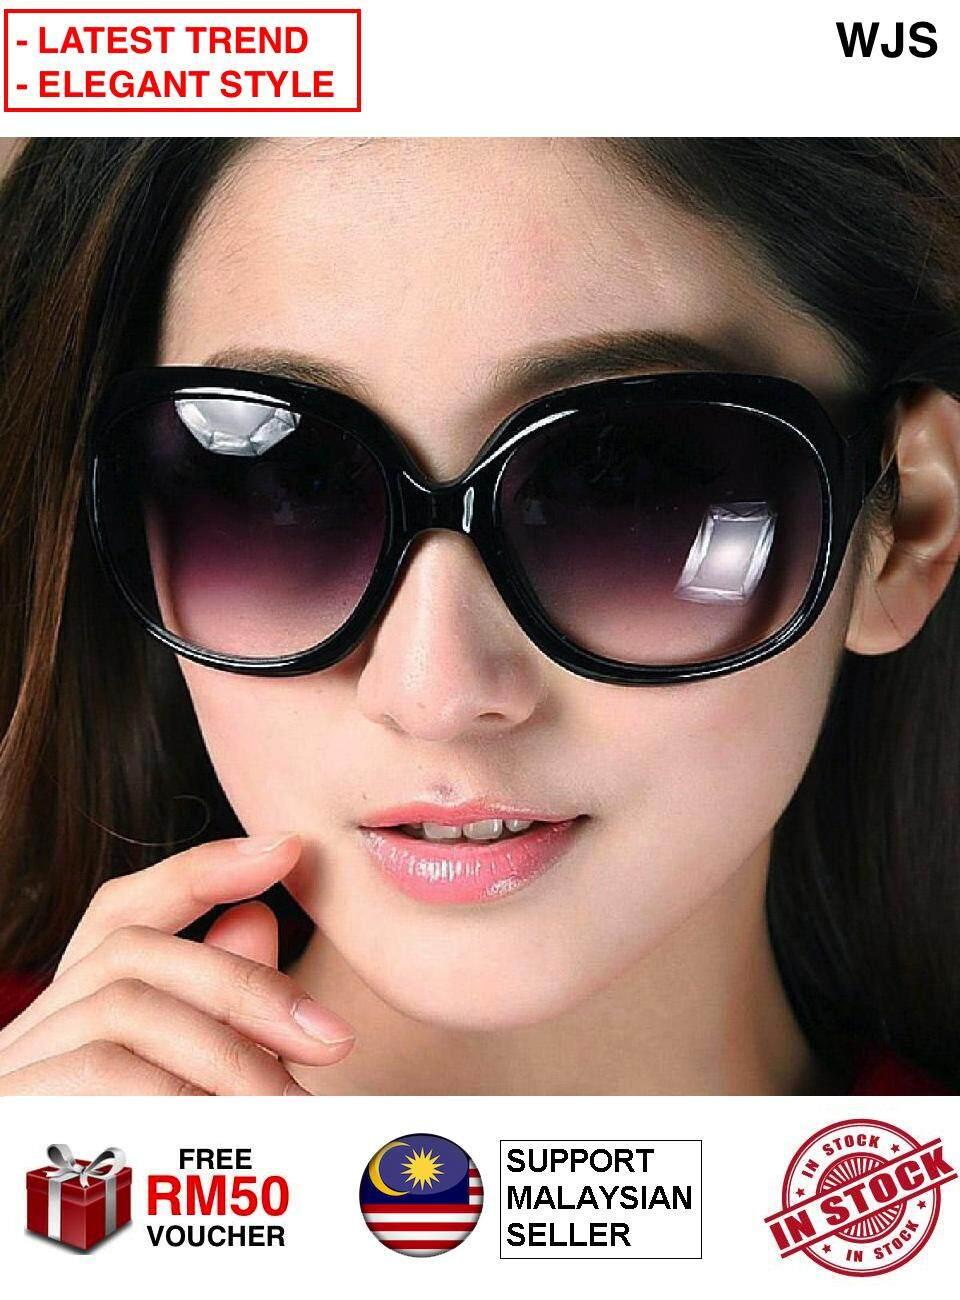 (LATEST FASHION TREND) WJS Women Sunglass Big Lens Girls Handsome Sun Glasses Spectacle Sunglasses Huge Lens Retro Classic Sunglasses BLACK PURPLE [FREE RM 50 VOUCHER]